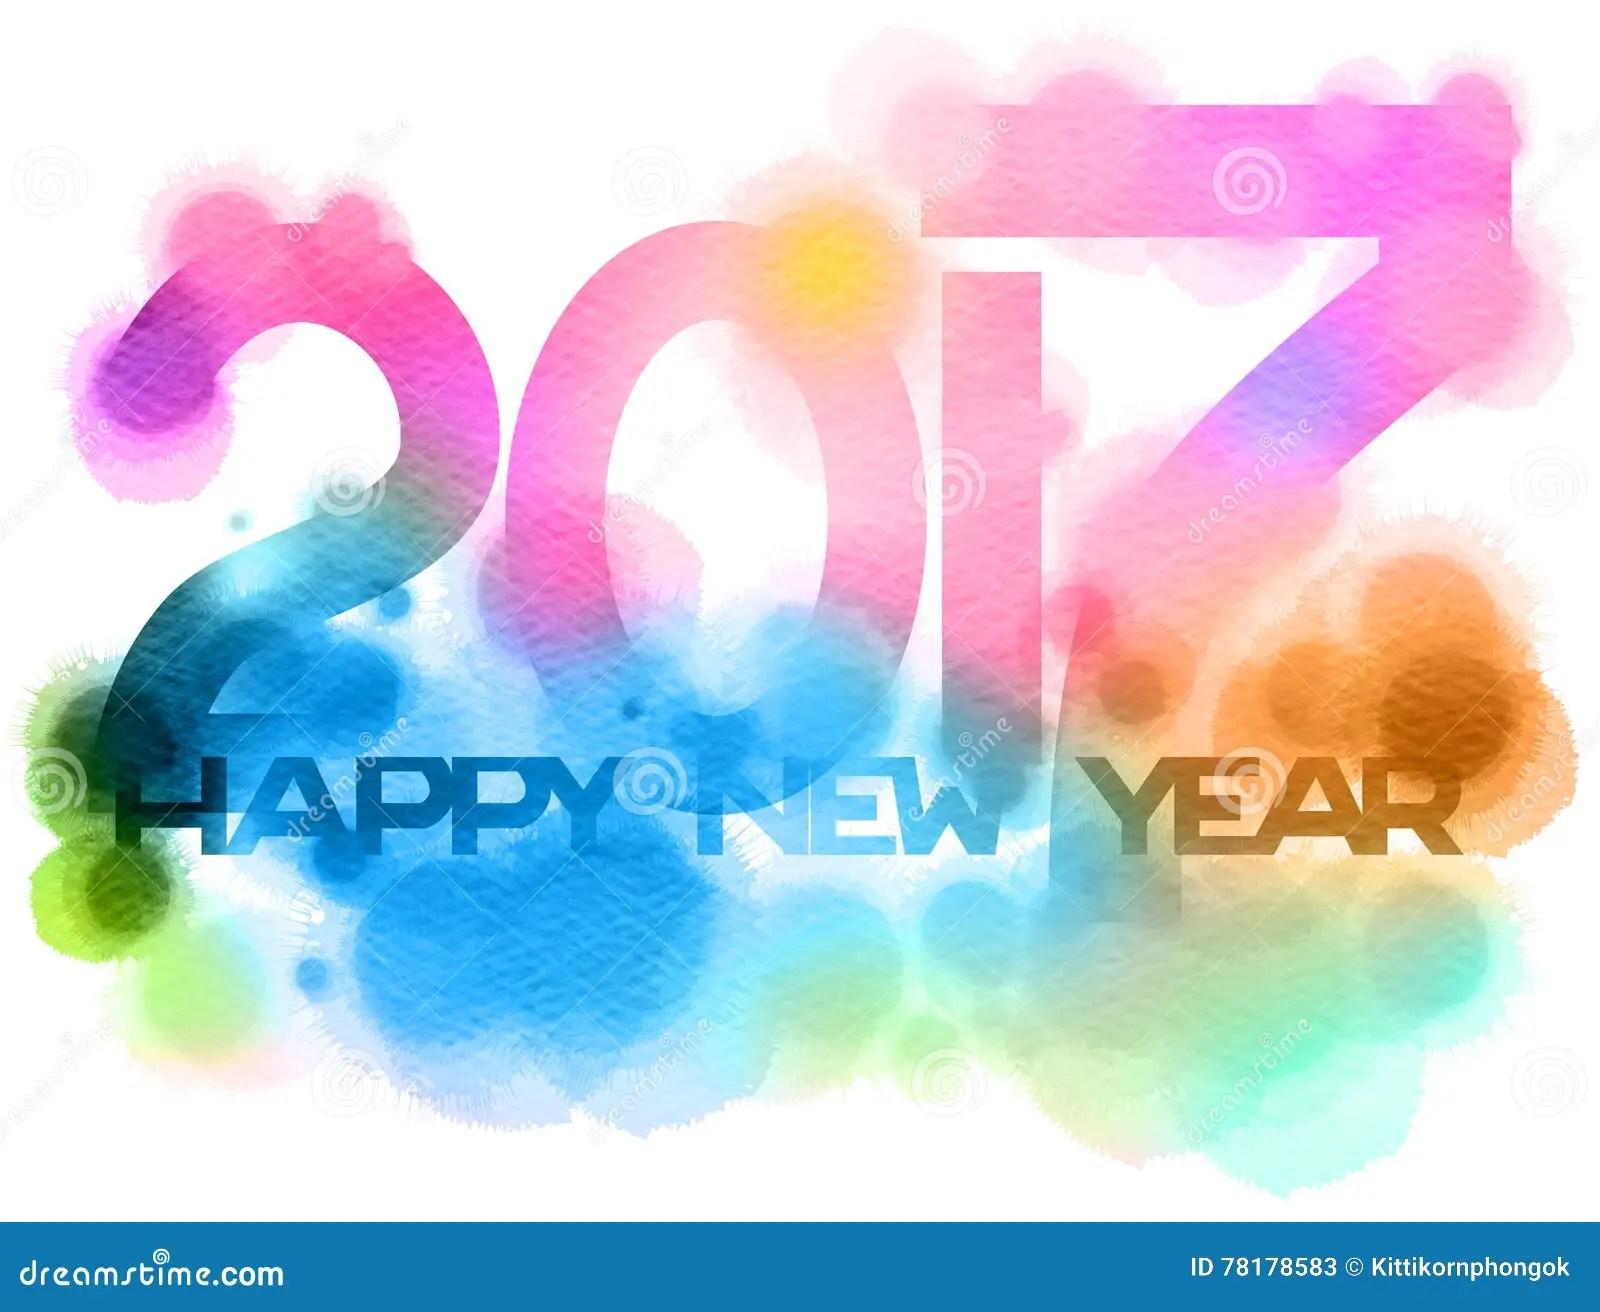 happy new year white background